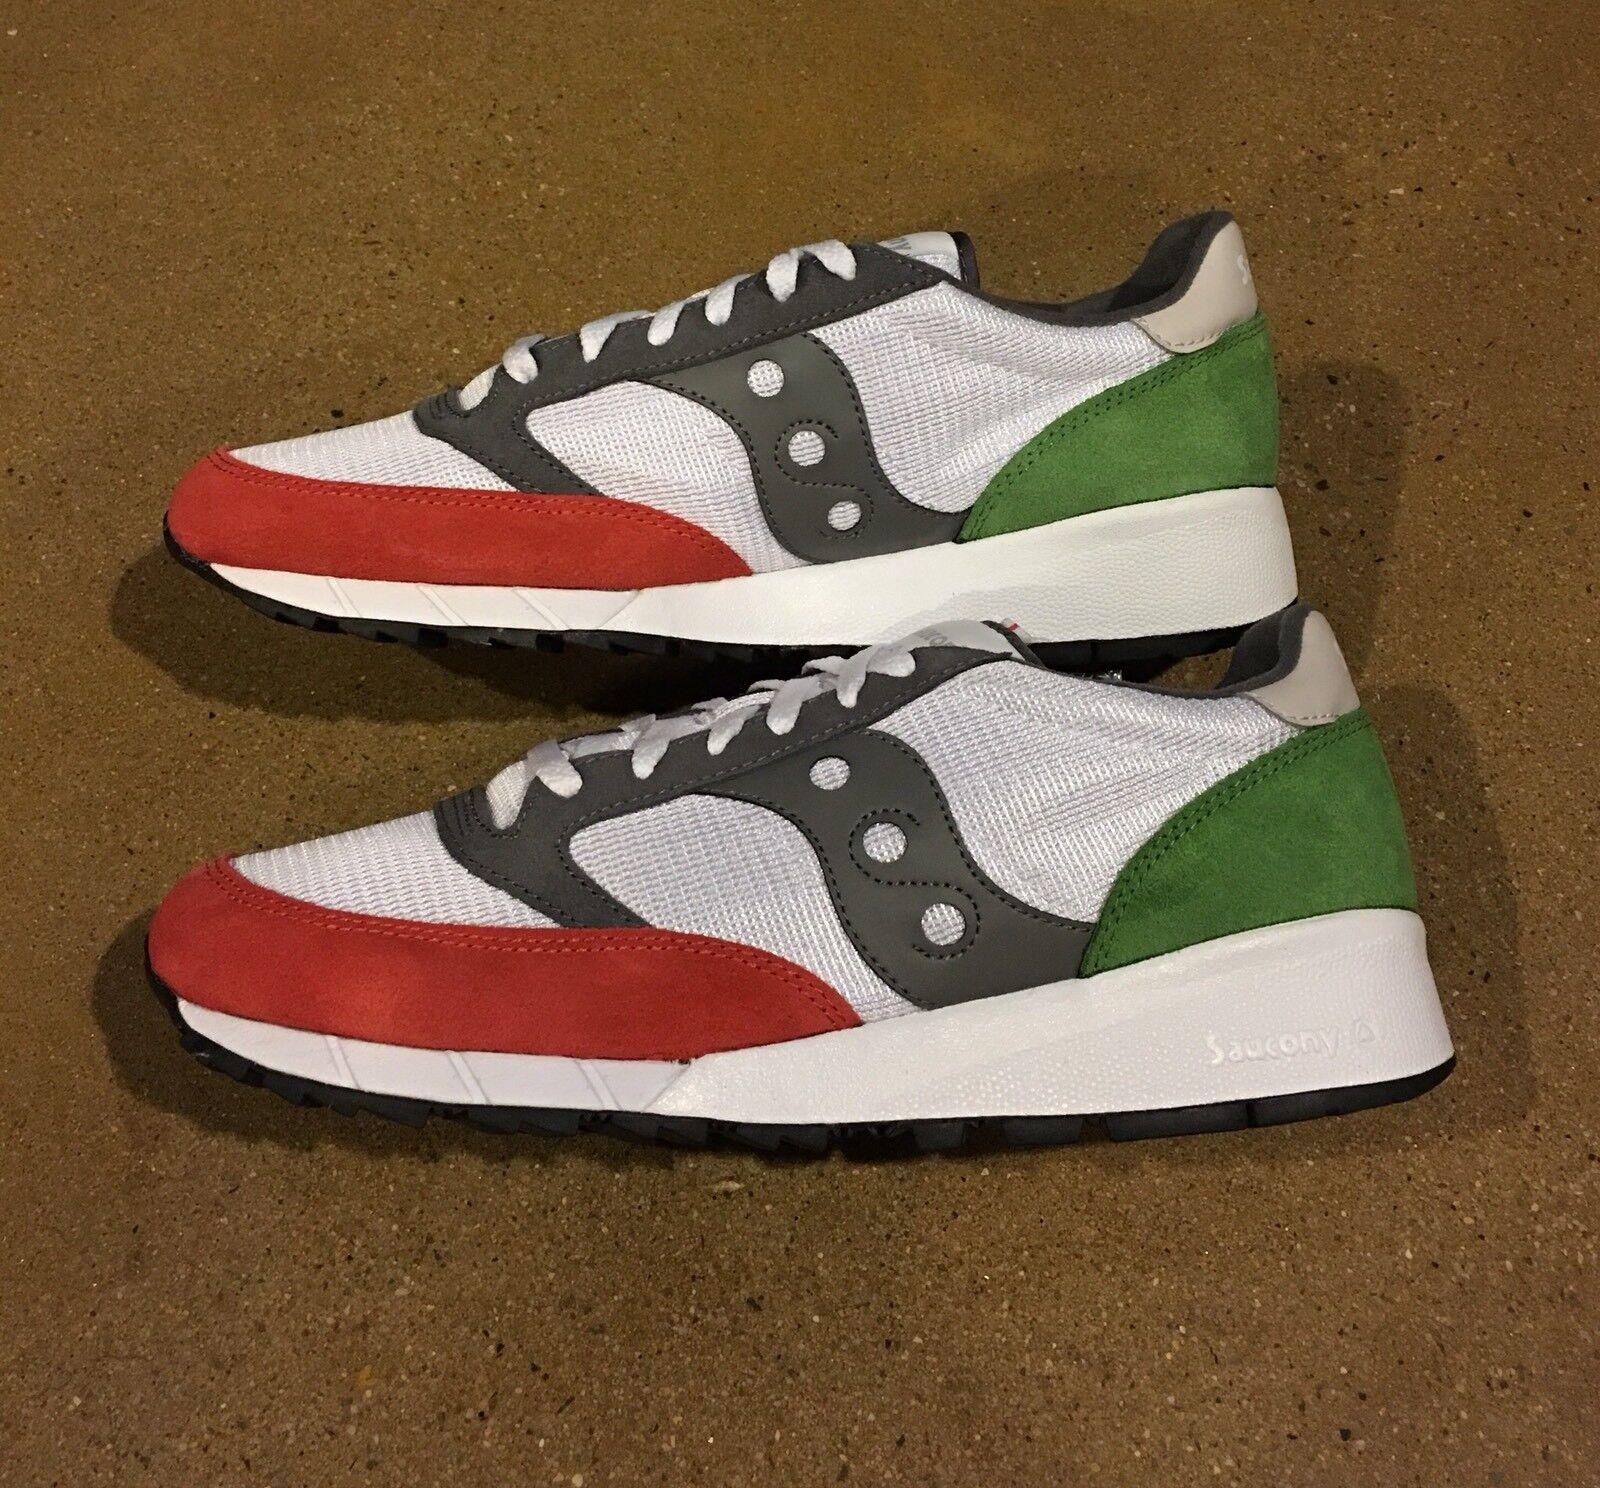 Saucony Jazz 91 uomo's Size 8 US White Red Green Running Shoes Sneakers Scarpe classiche da uomo